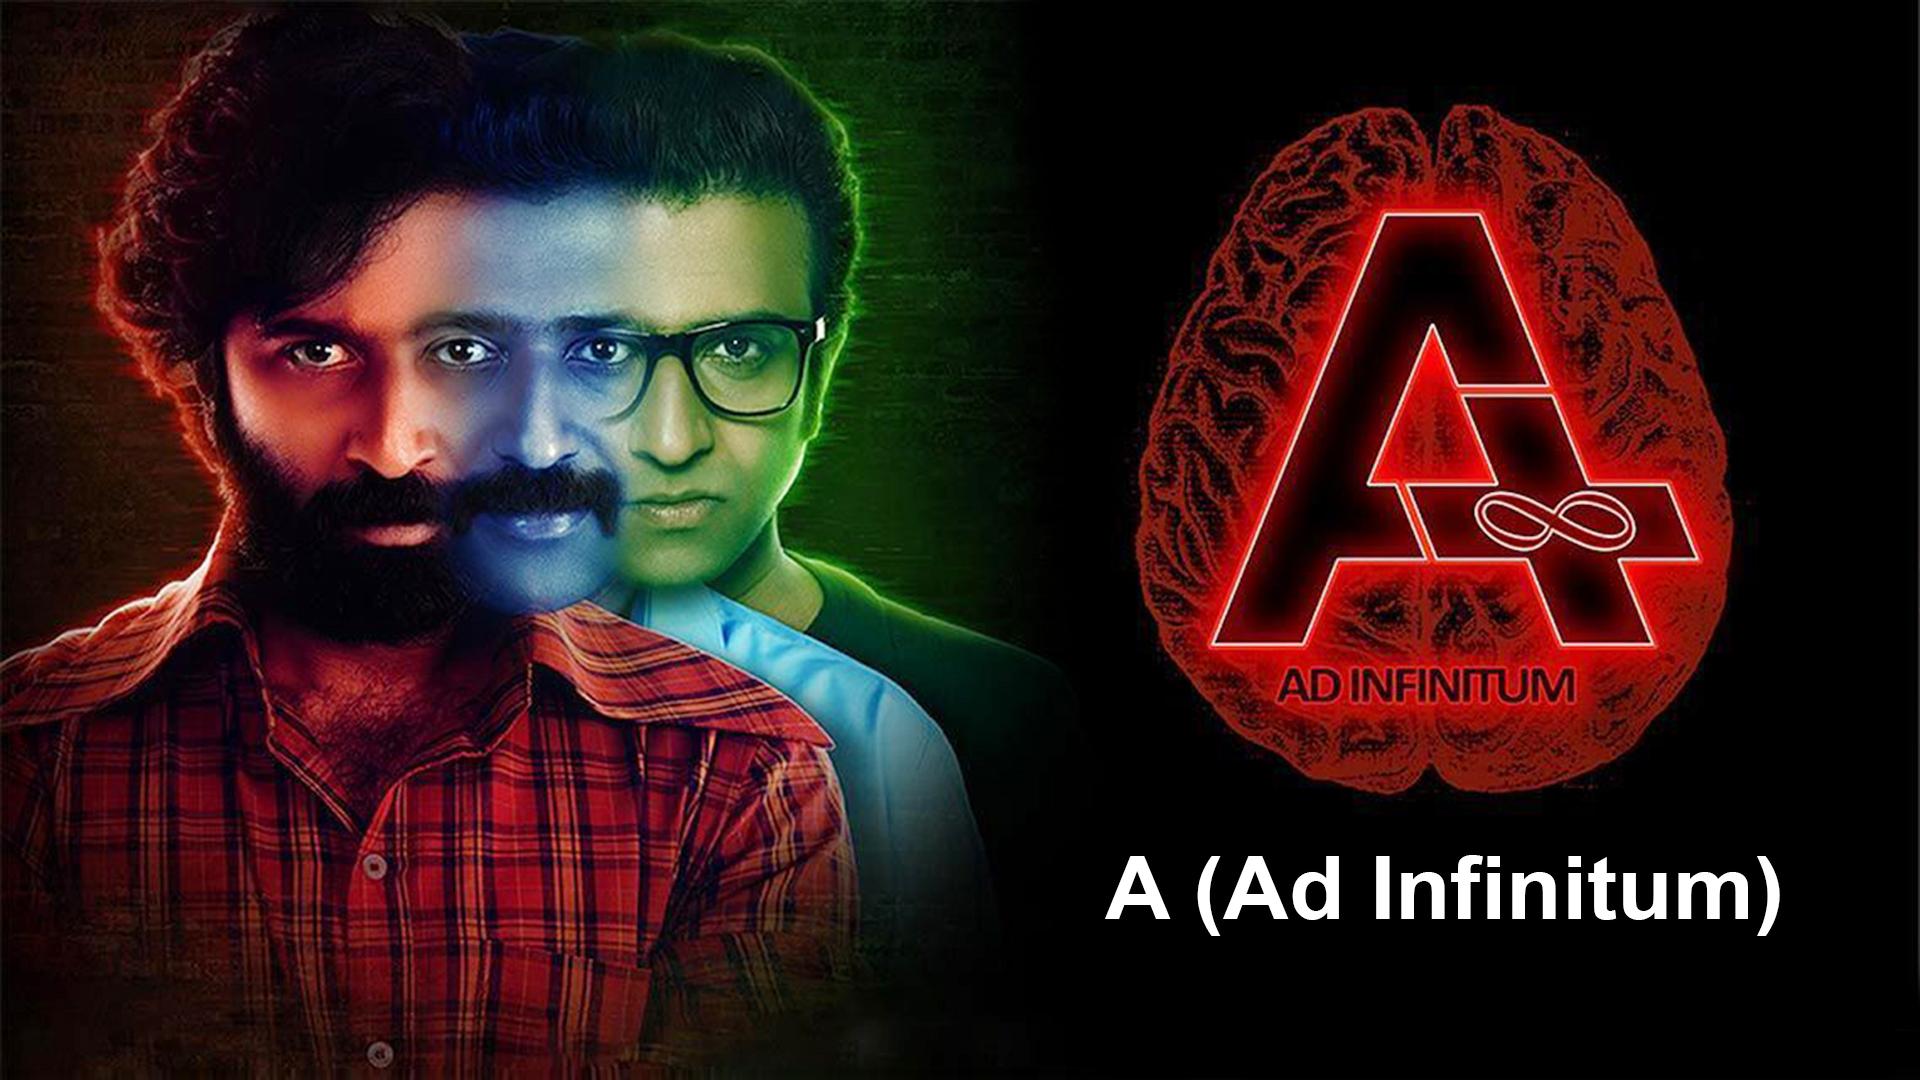 A (Ad infinitum)